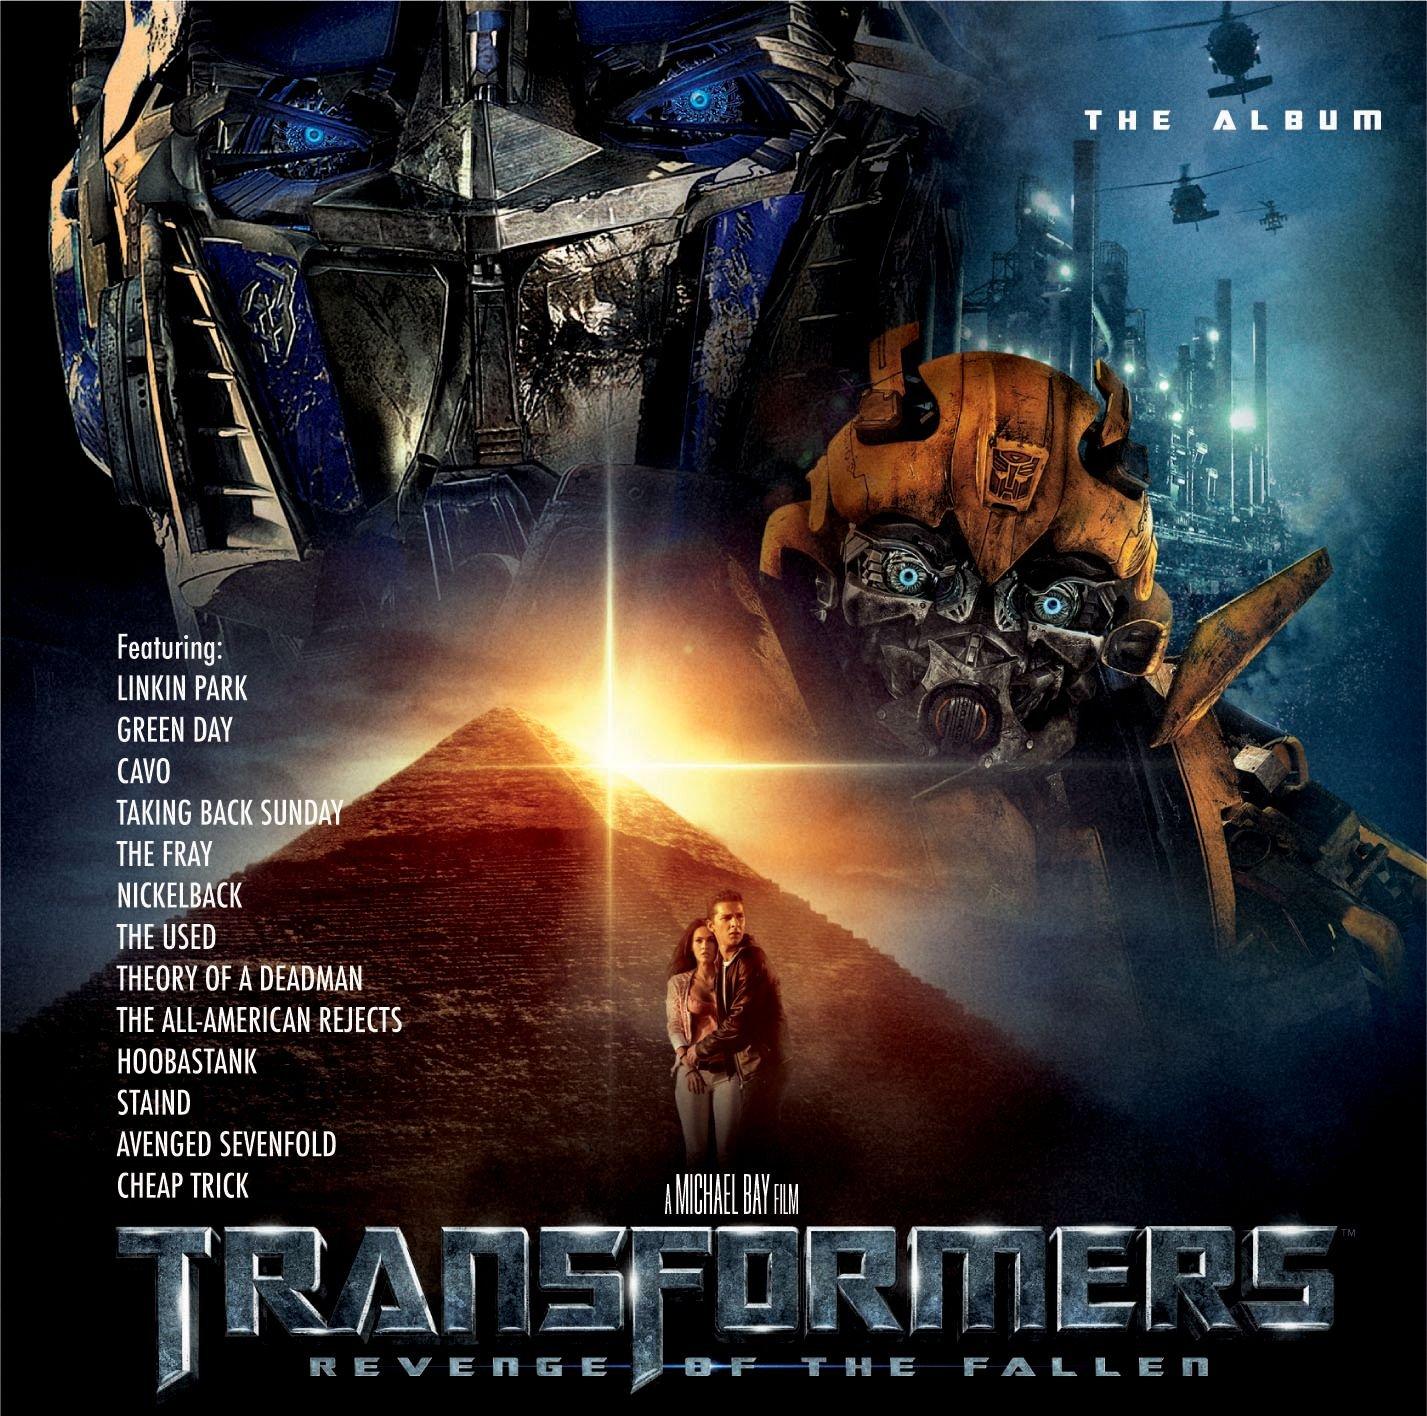 Transformers: Revenge Of The Fallen - The Album